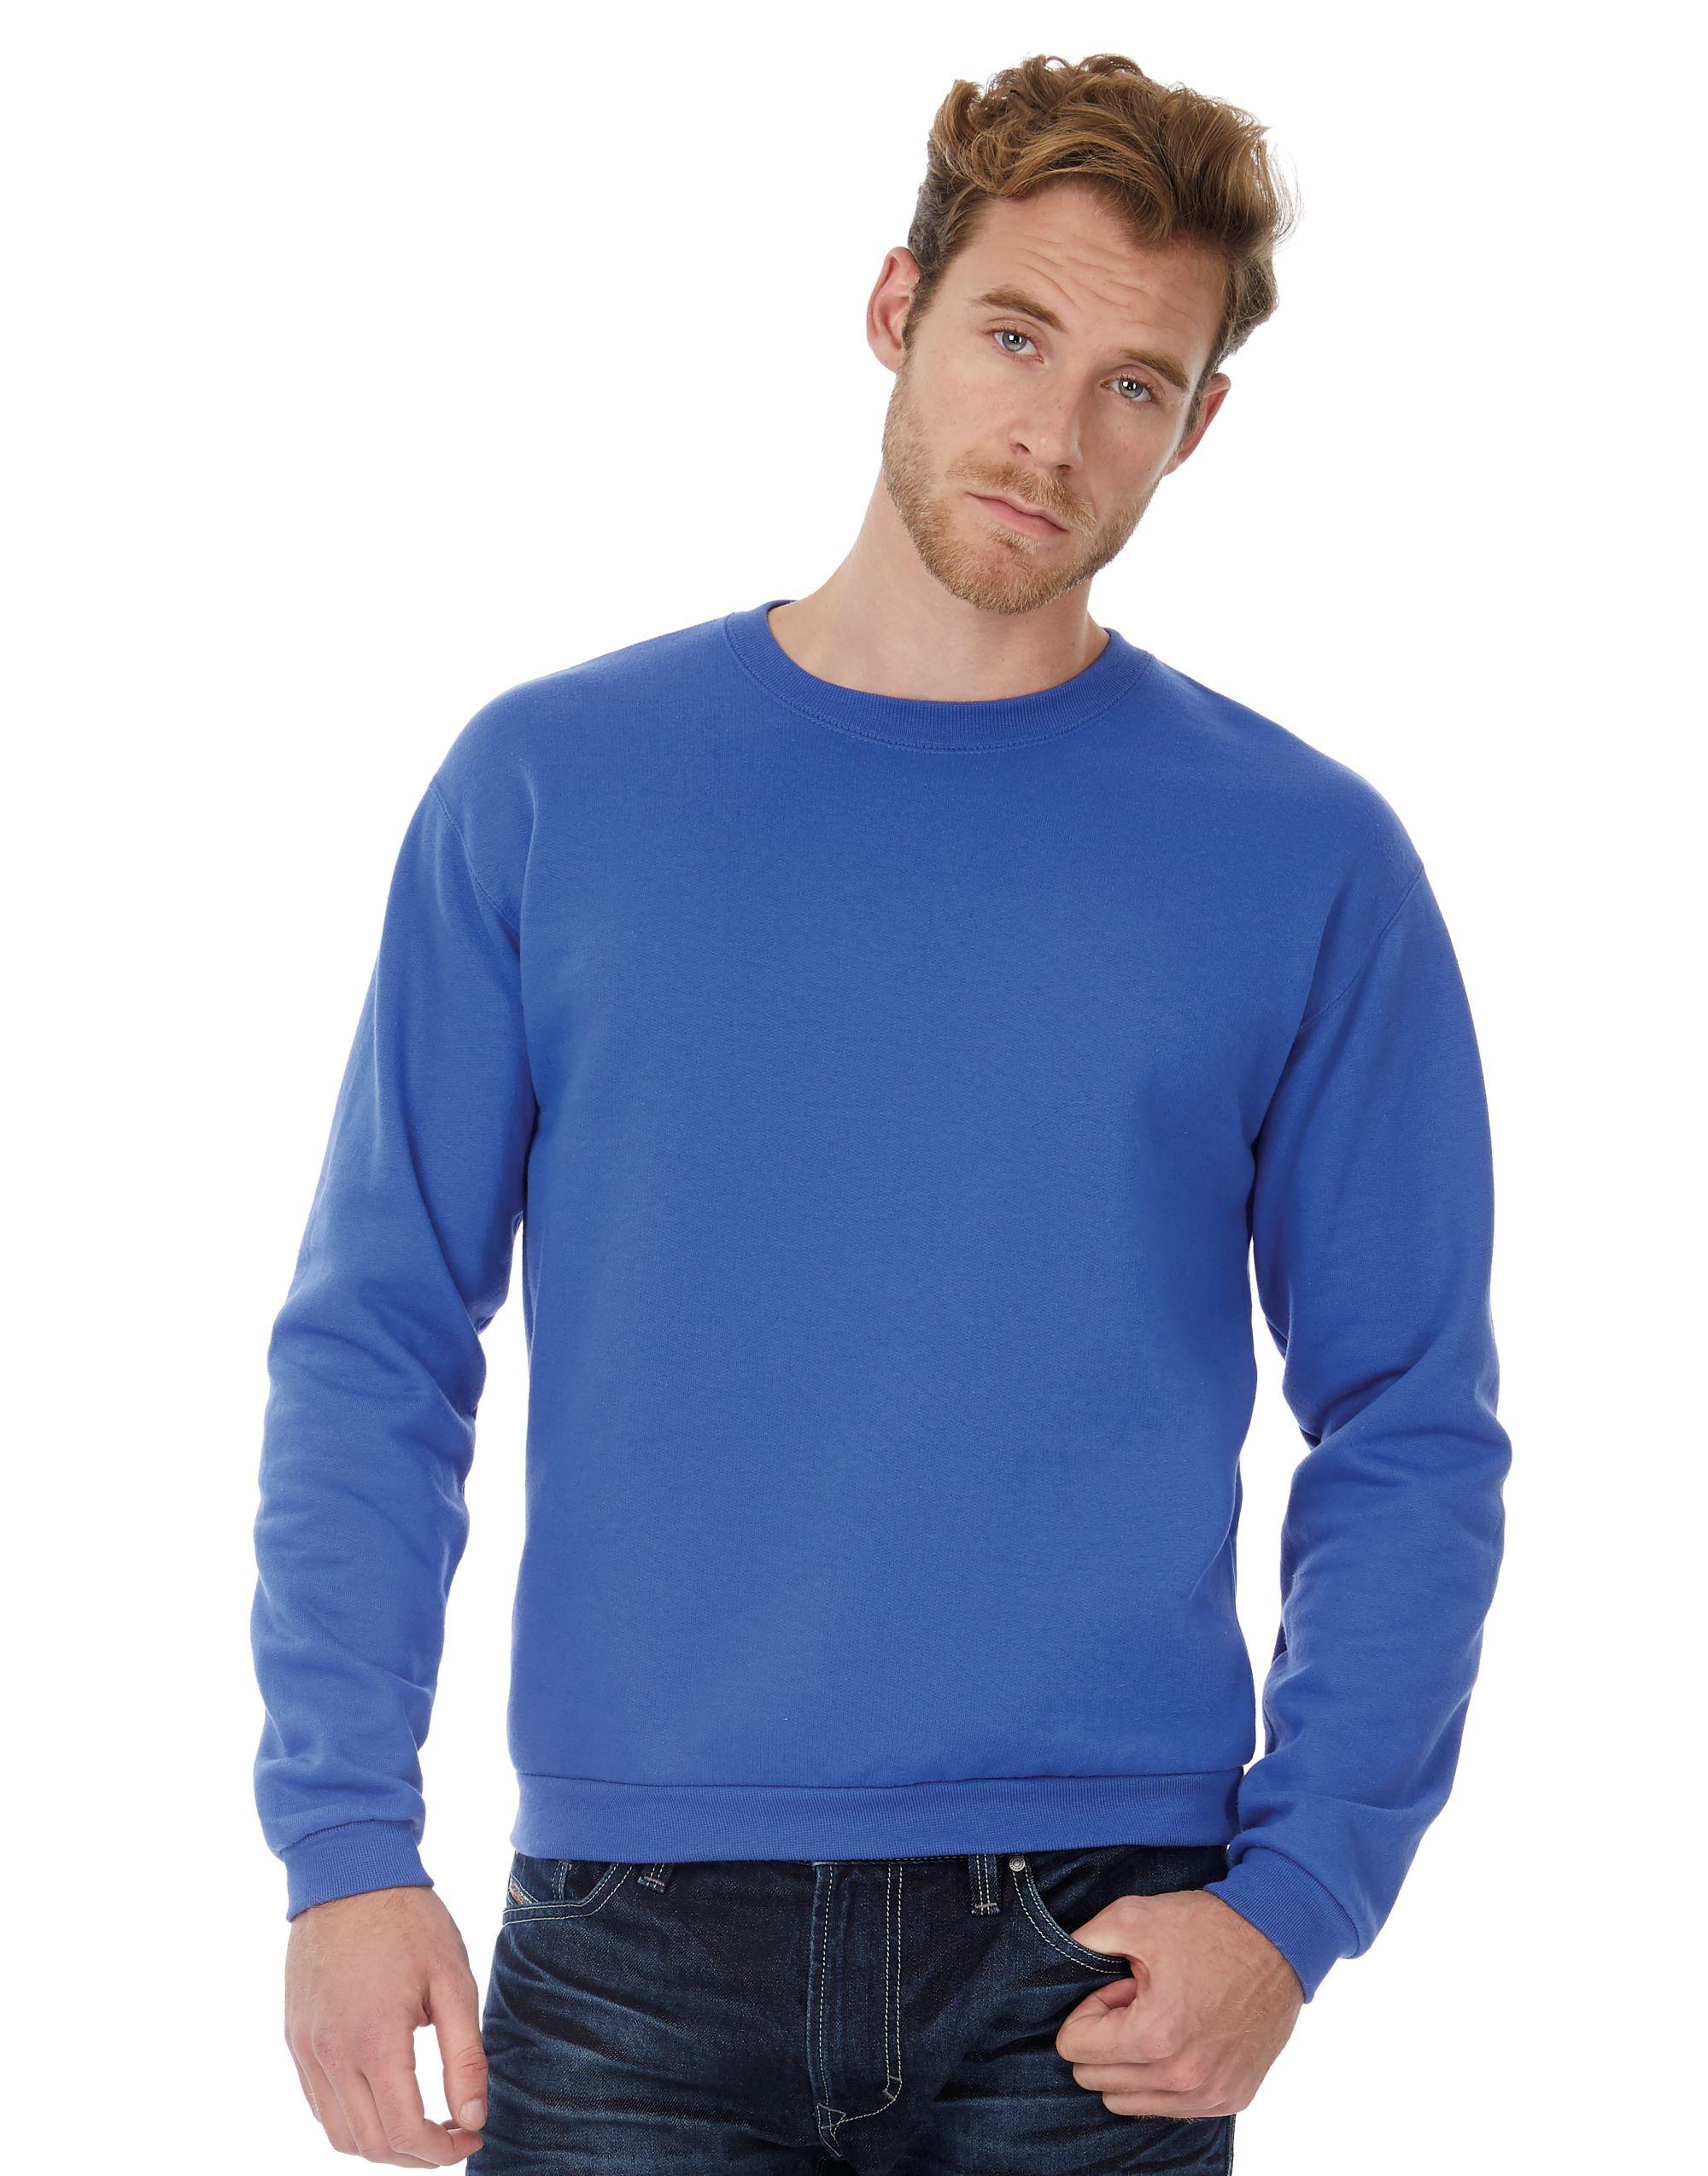 B&C Unisex ID.202 50/50 Sweatshirt